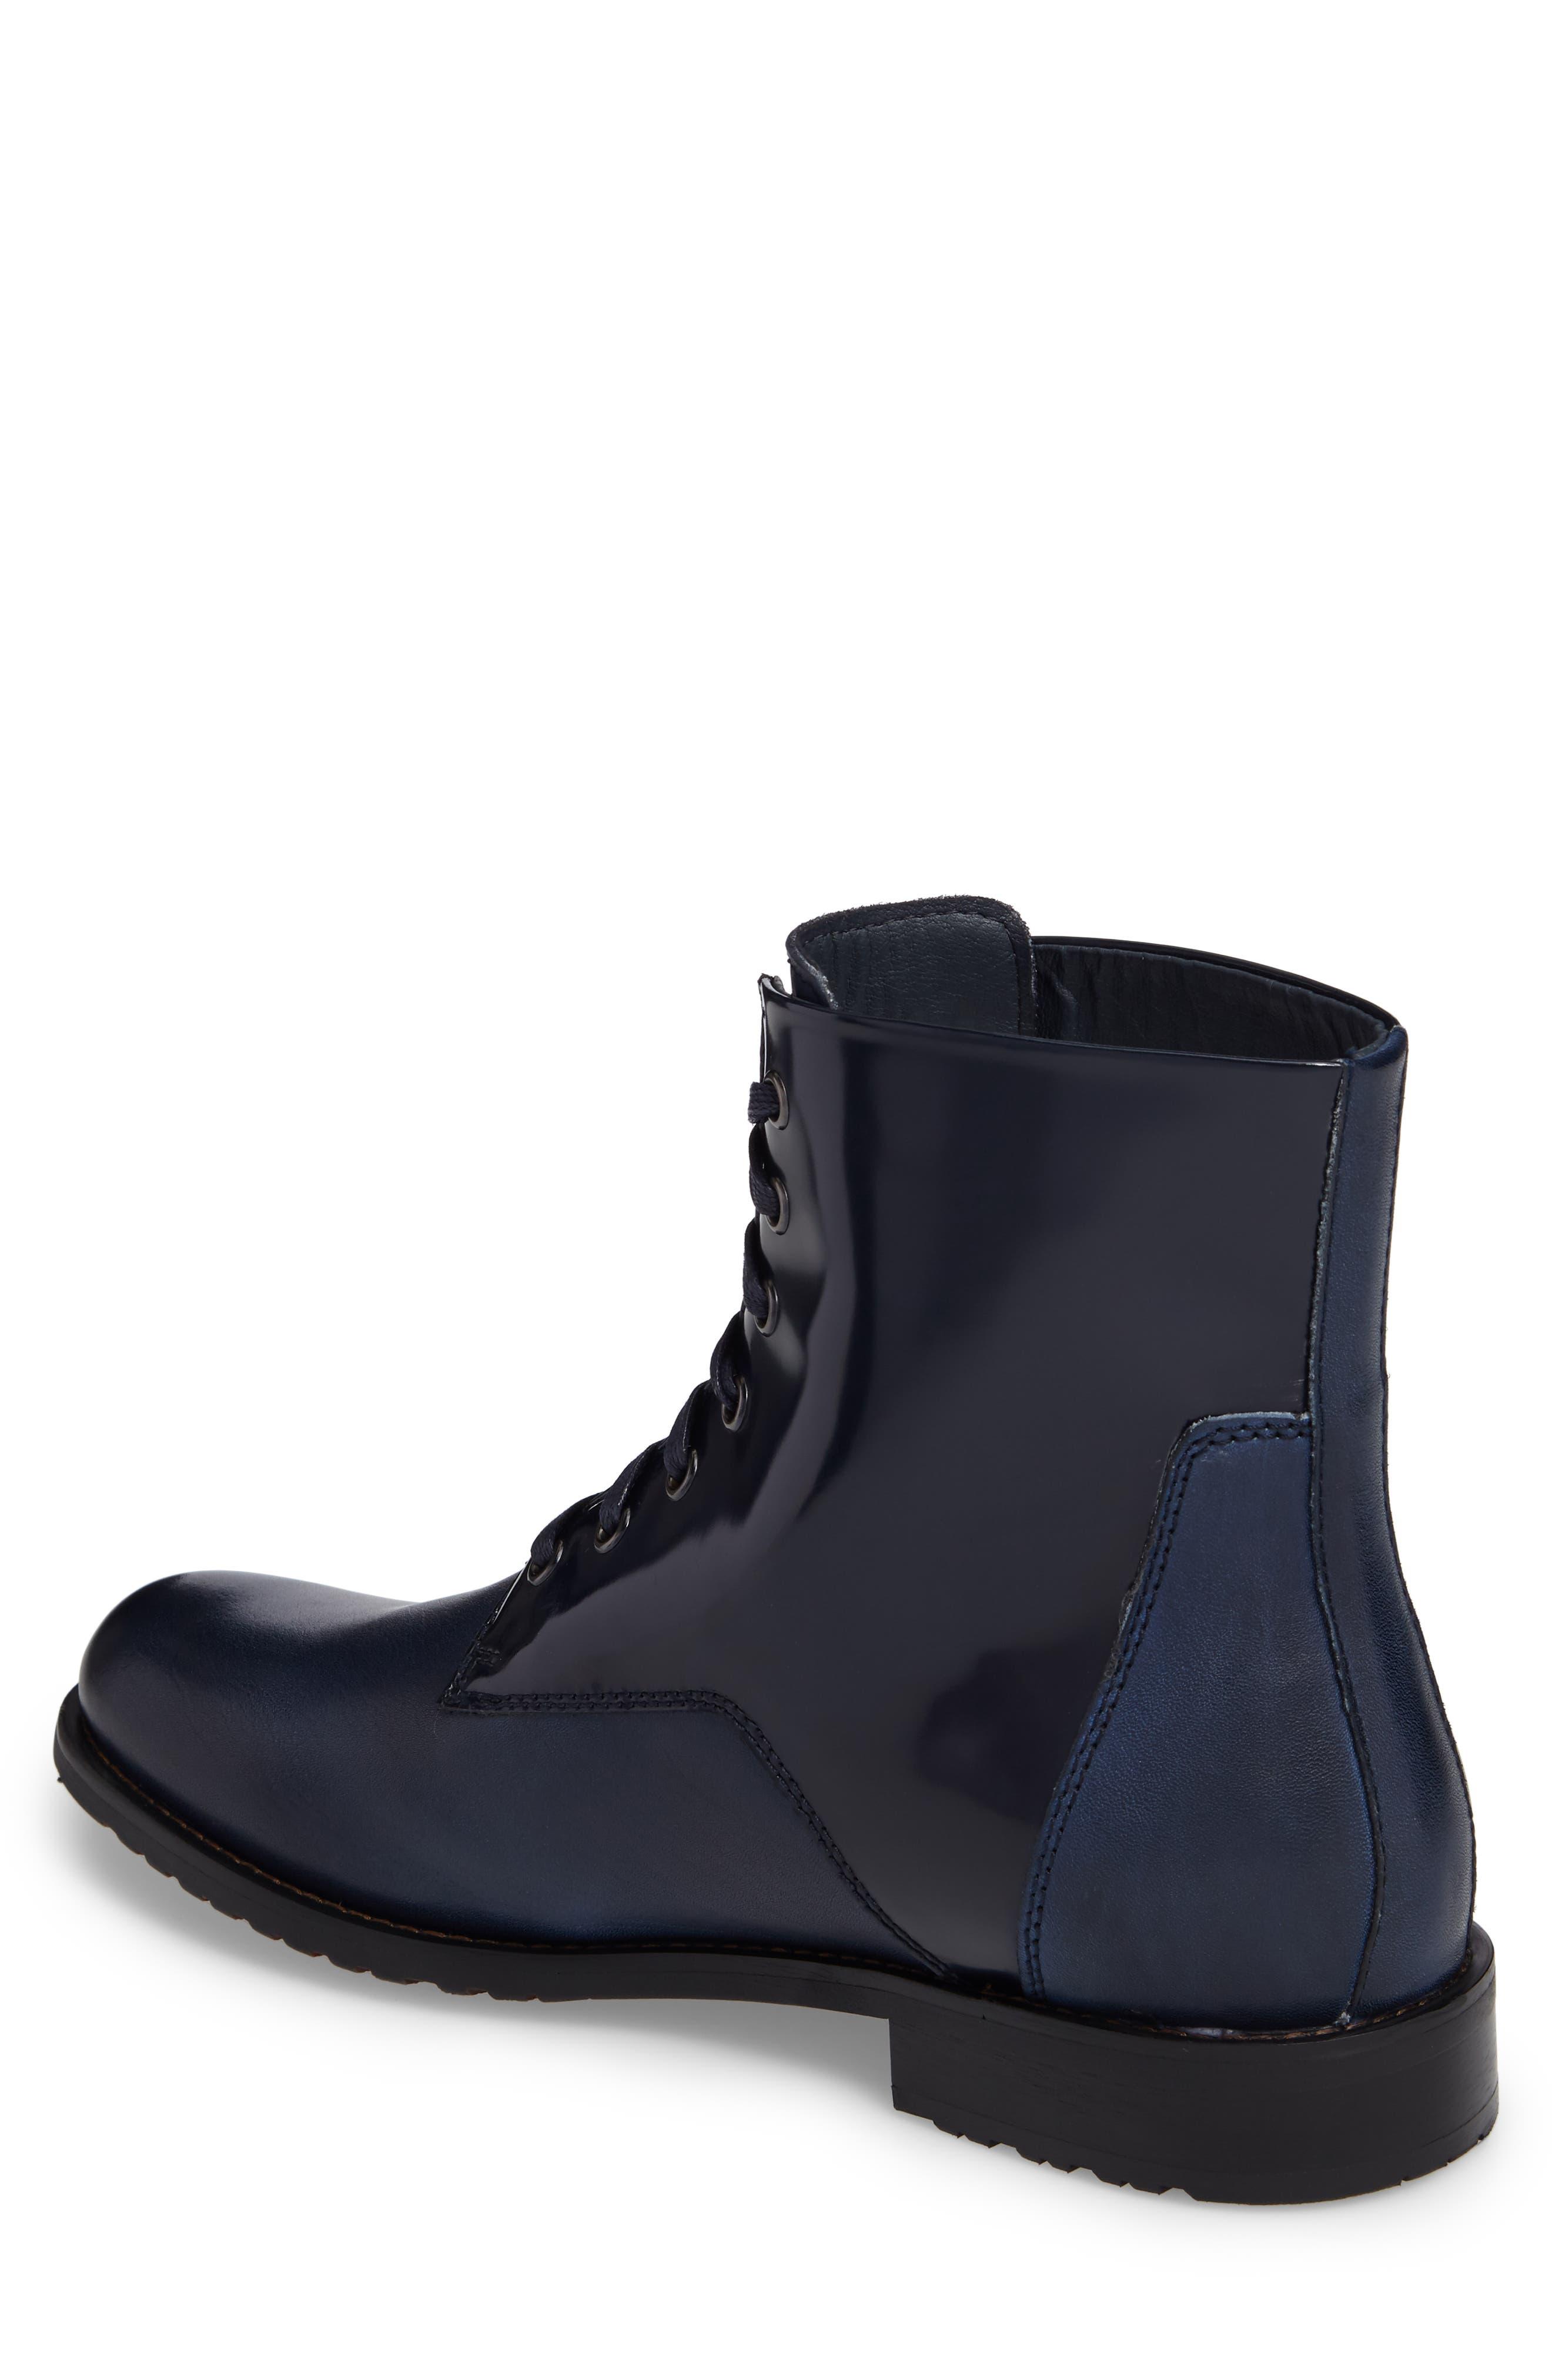 Alternate Image 2  - English Laundry Athol Plain Toe Boot (Men)